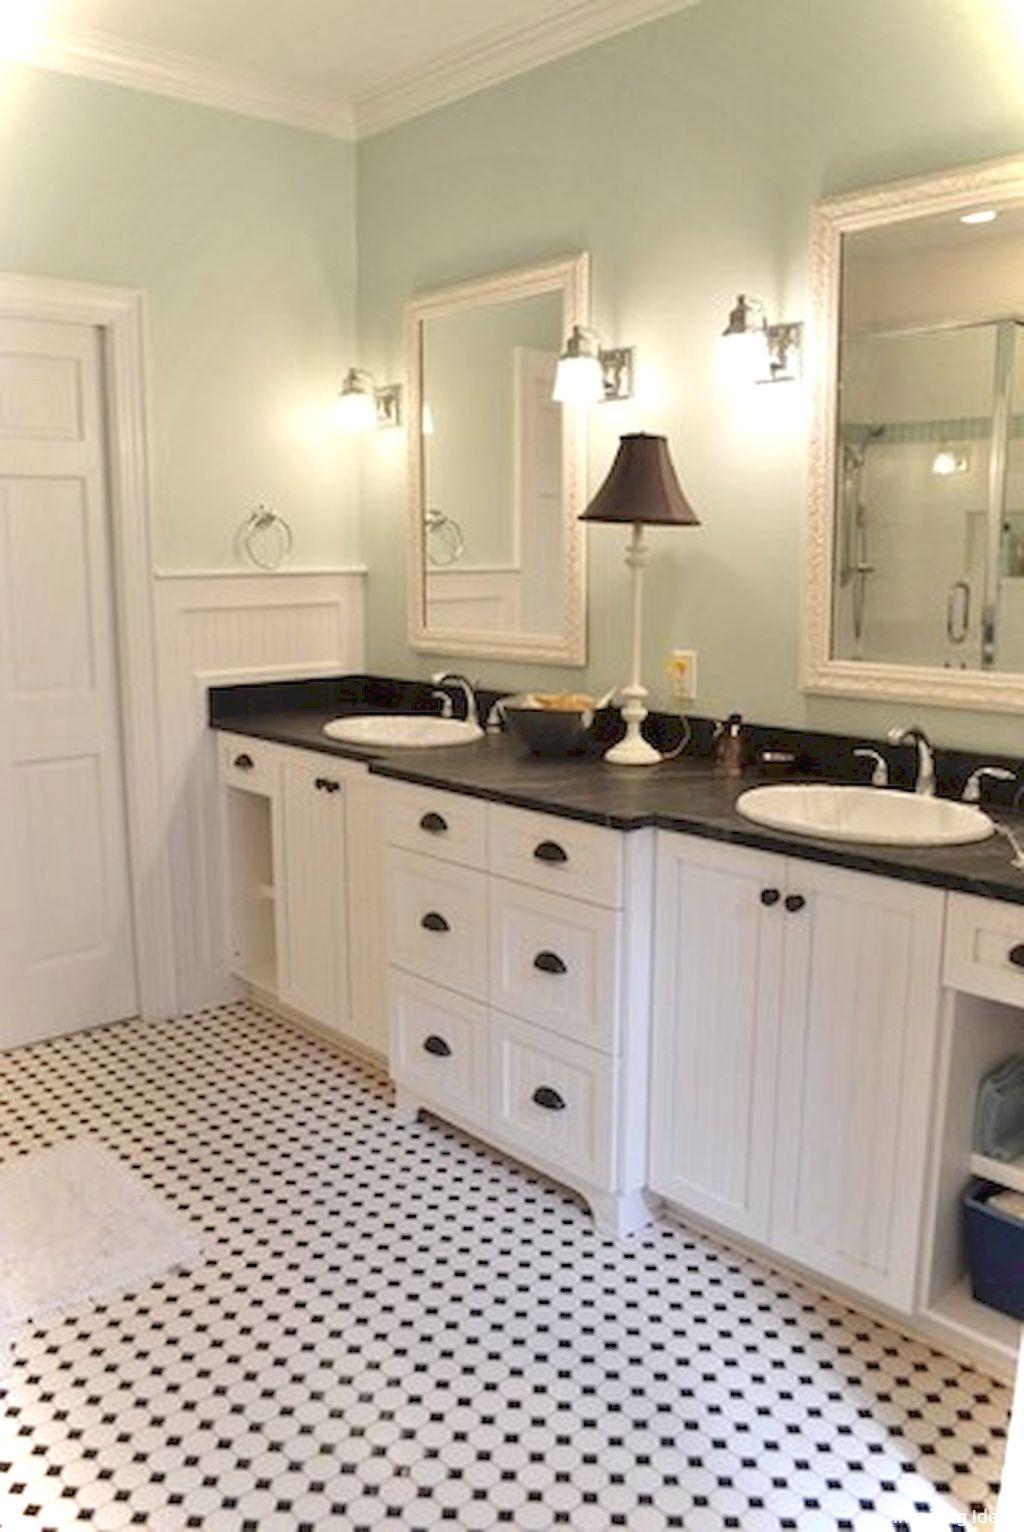 99 Luxury Black And White Bathroom Ideas In 2020 White Bathroom Tiles Cottage Bathroom Coastal Cottage Bathroom